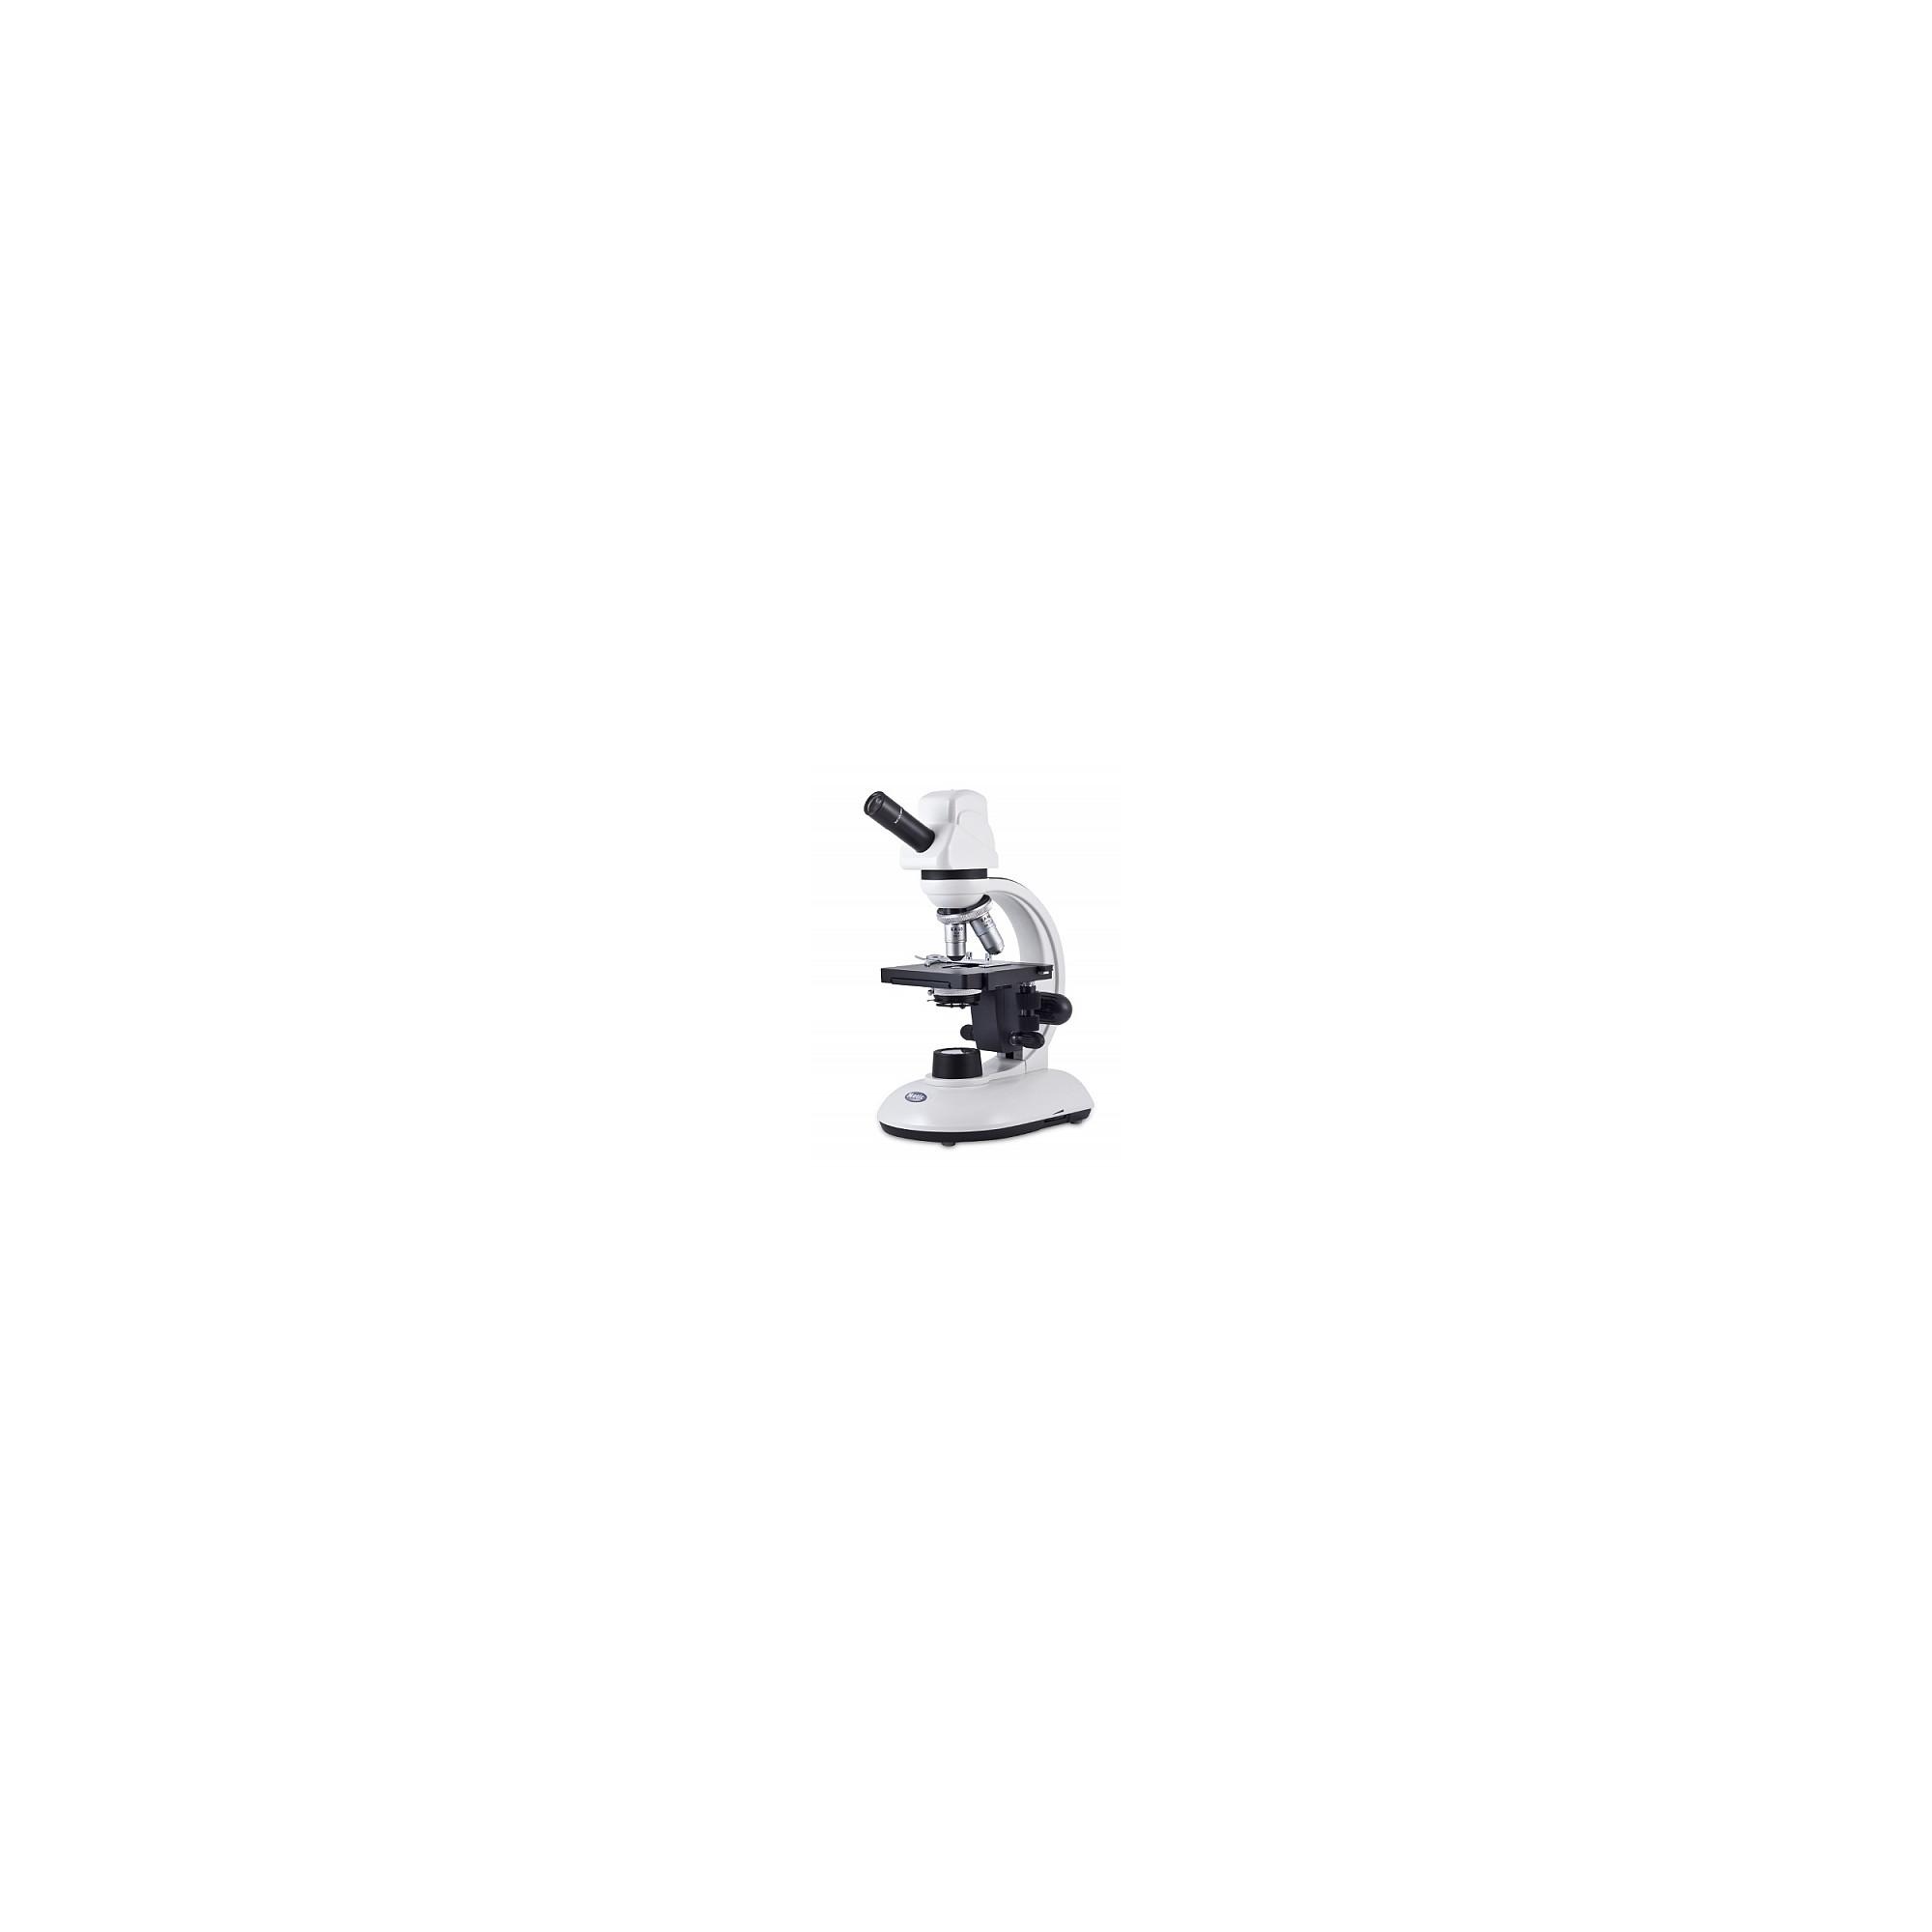 MICROSCOPIO DIGITAL MONOCULAR MOTIC MODELO DM-1802